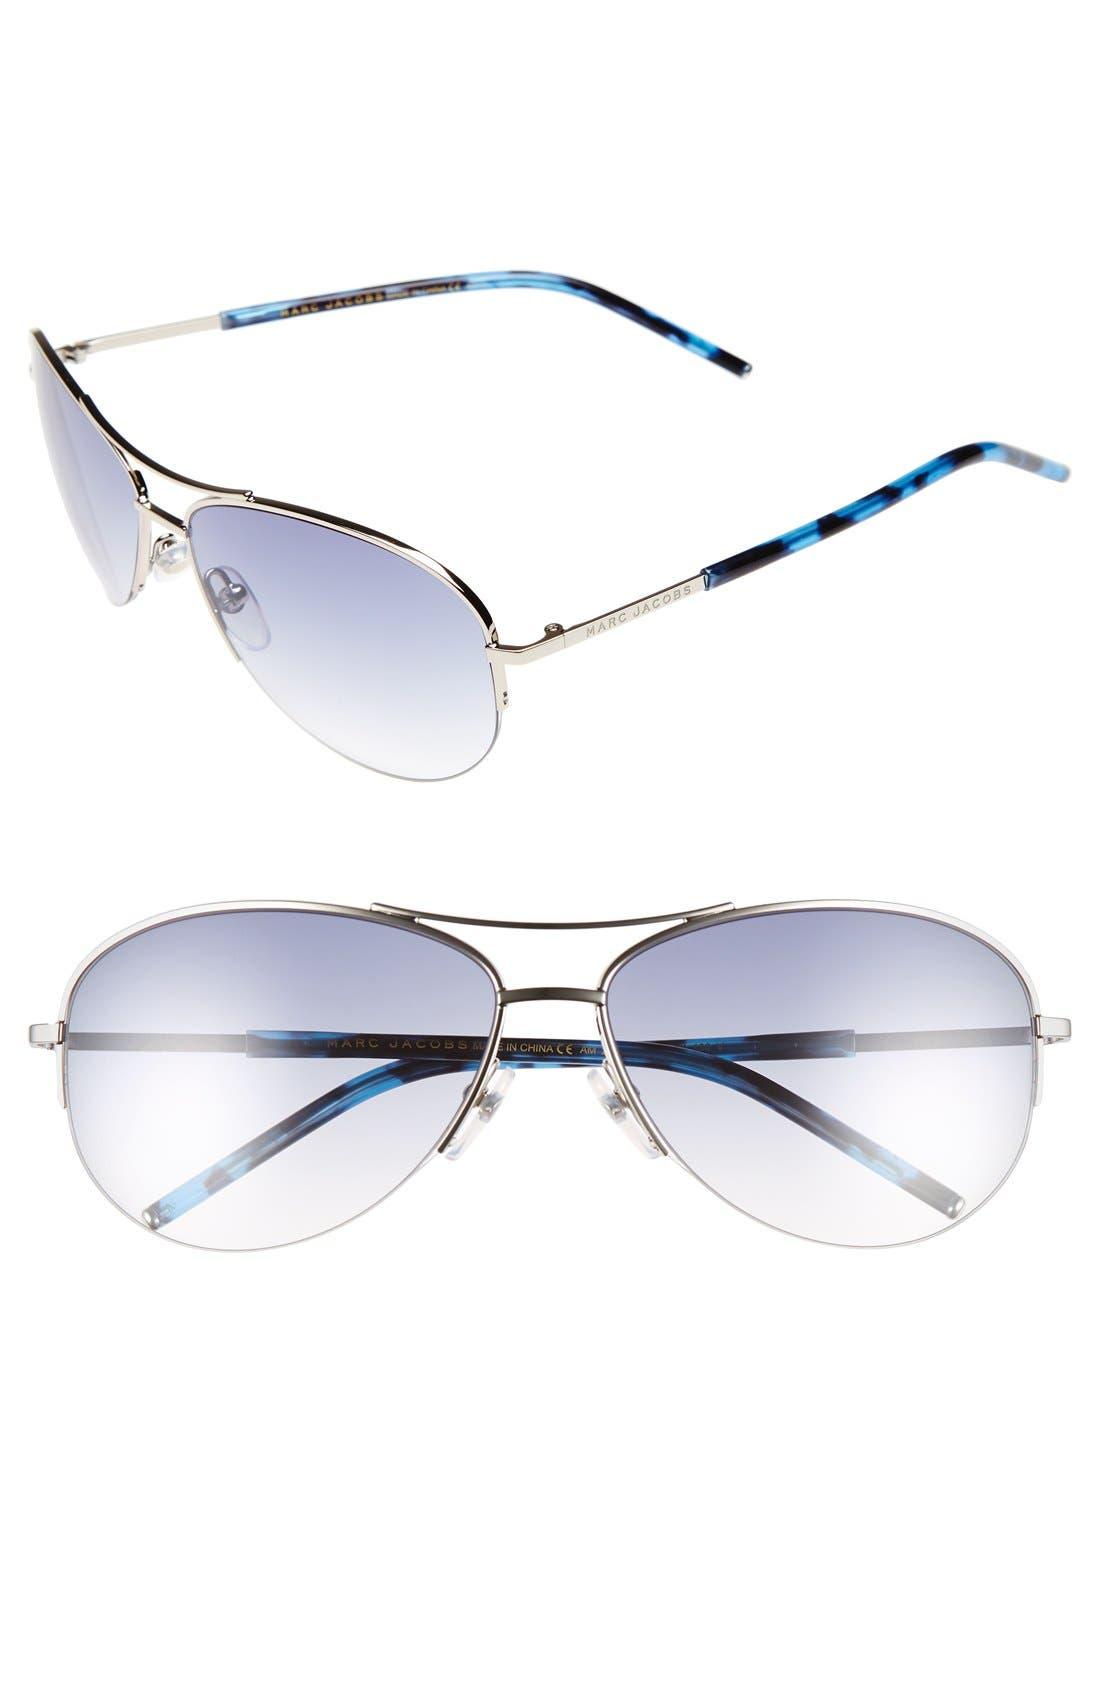 59mm Semi Rimless Sunglasses,                         Main,                         color, Palladium